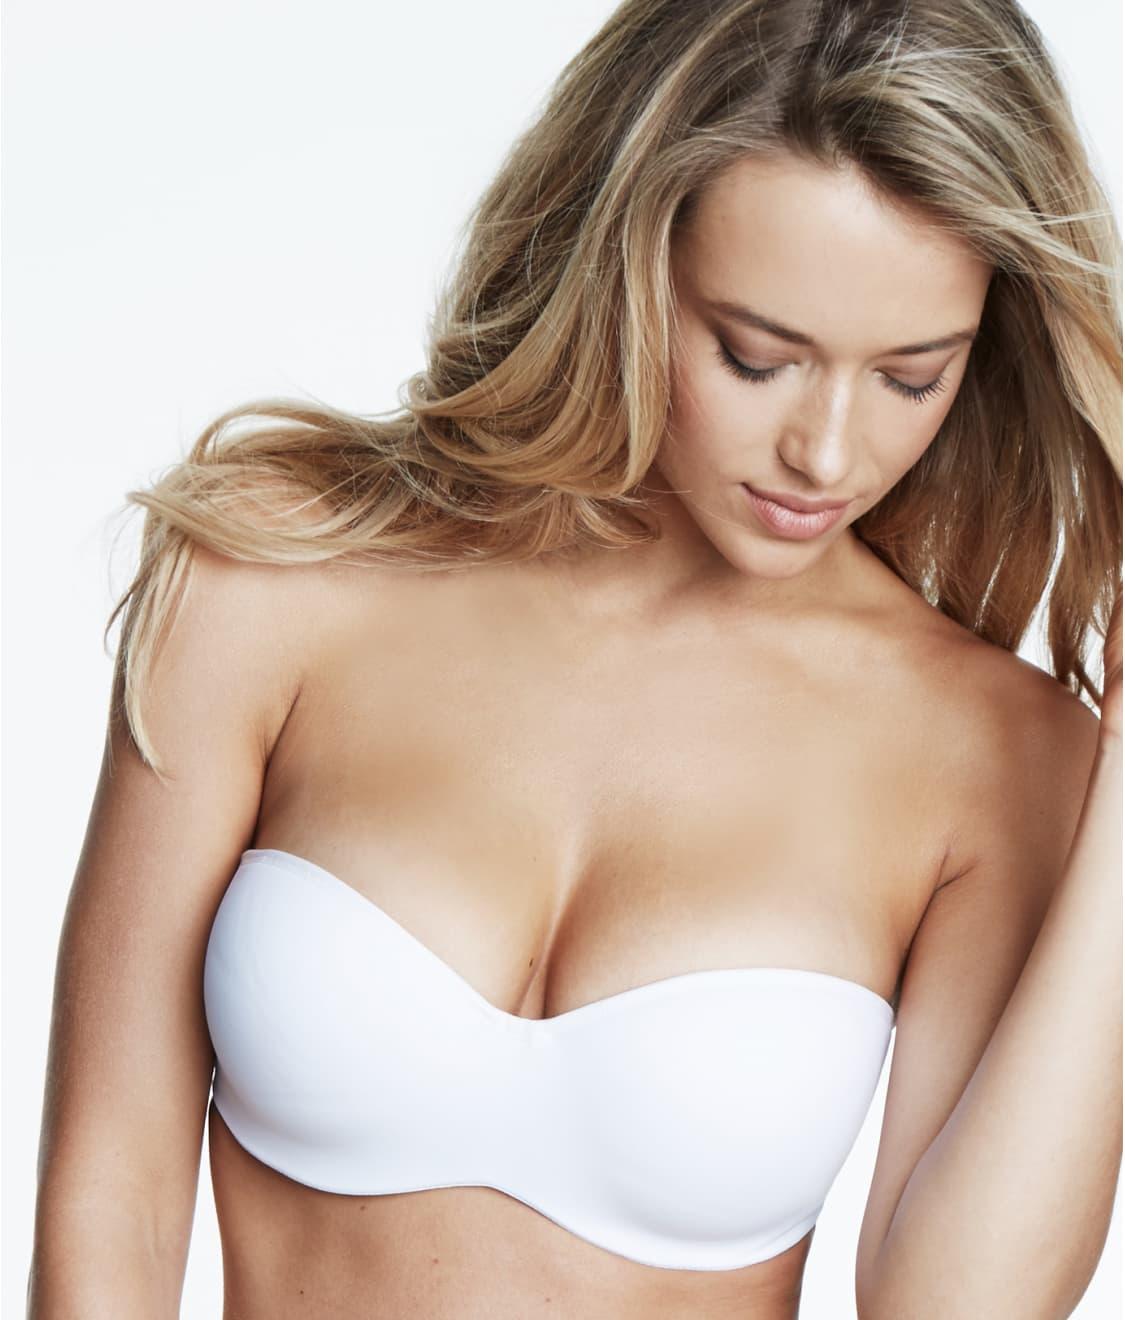 Hot Dominique Jane nude (37 photo), Tits, Sideboobs, Boobs, bra 2020